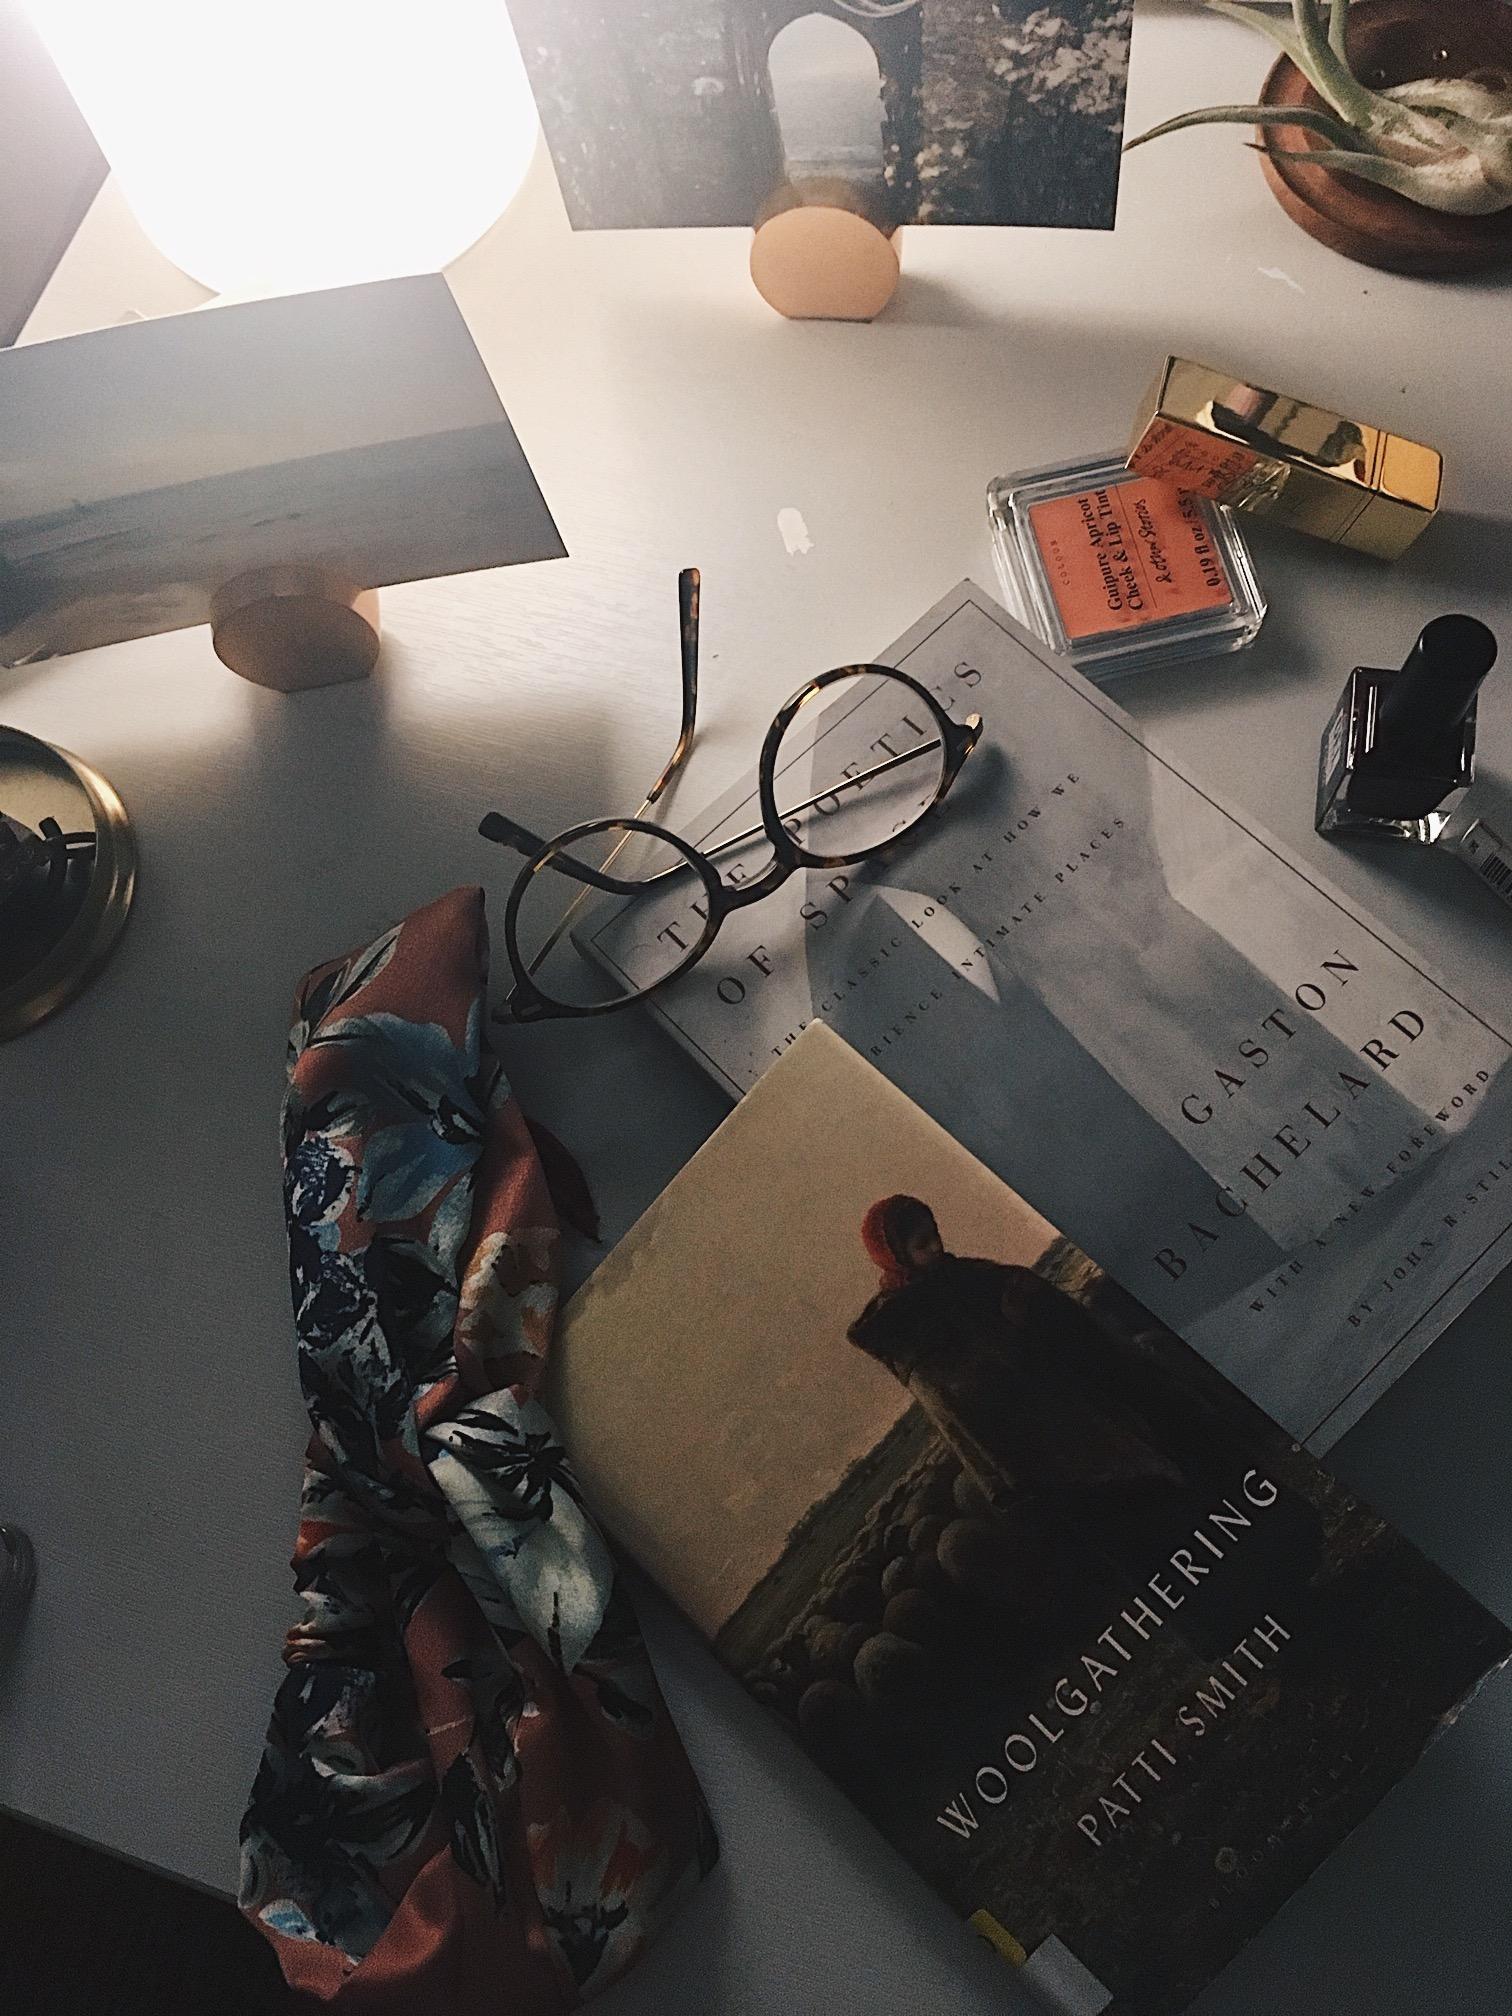 Madeline Baker Summer Reads The Attic on Eighth Woolgathering .JPG